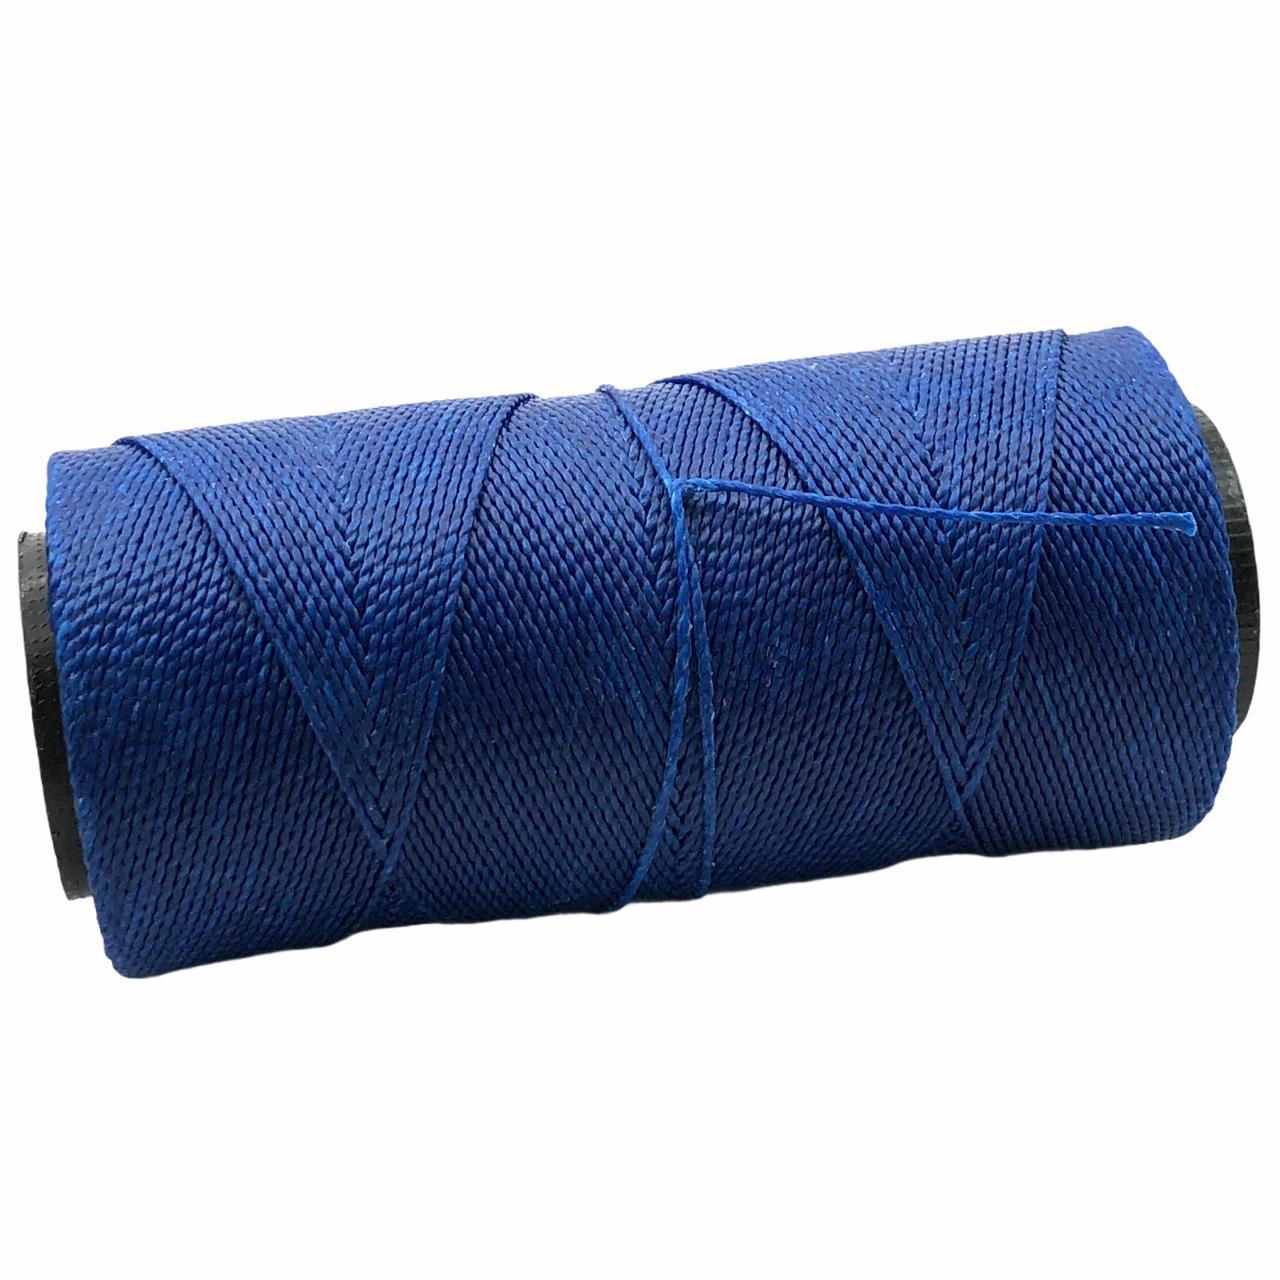 CE13 - Cordonê Encerado Azul Royal - 10metros